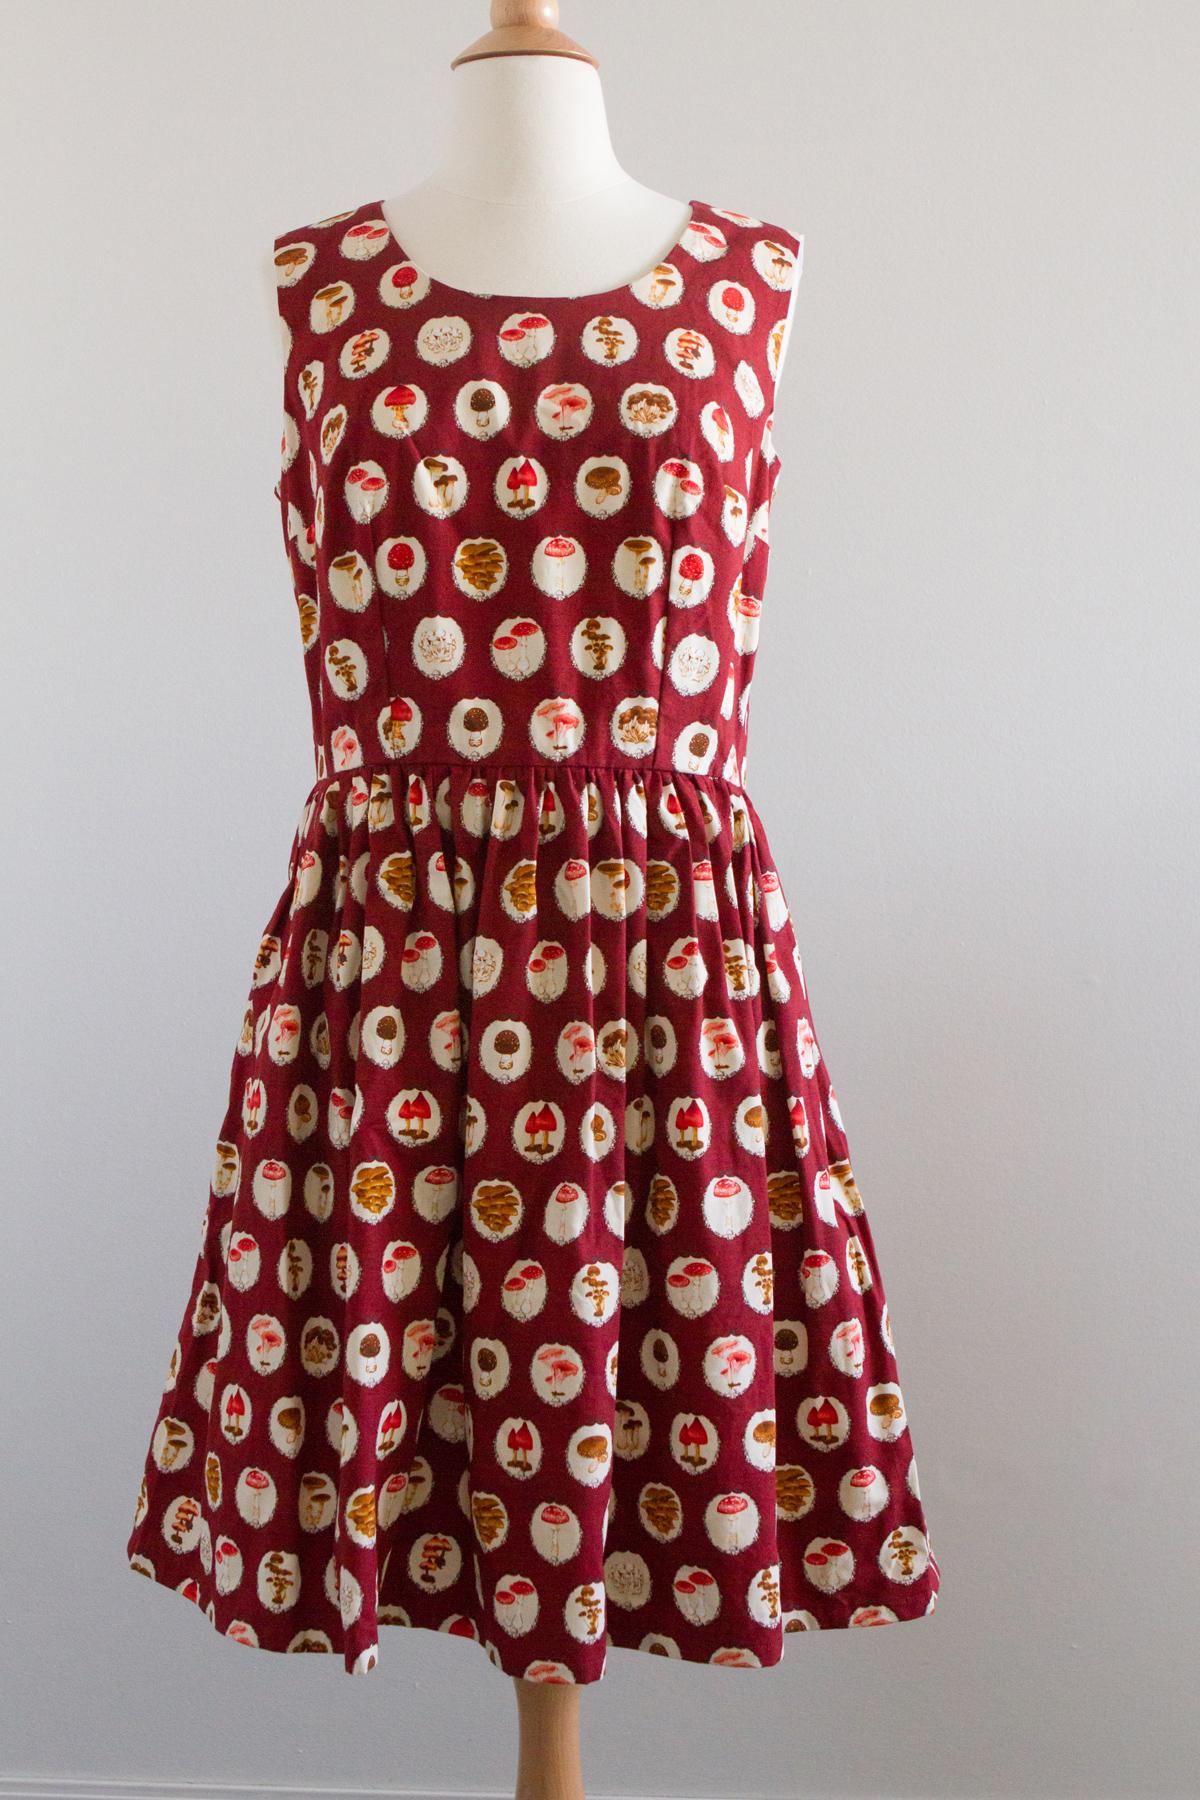 Red mushroom dress